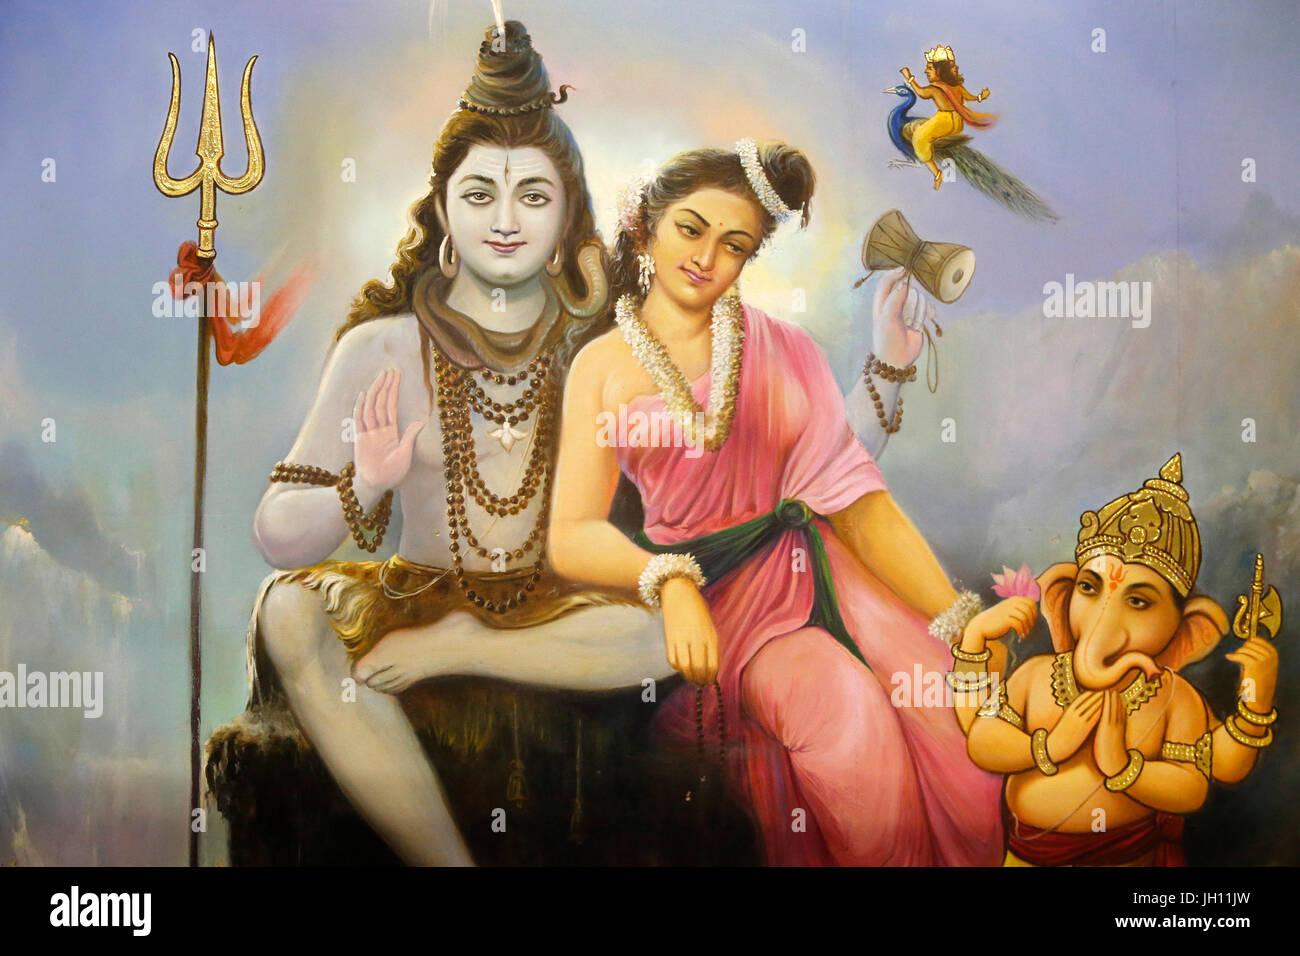 Shiva Parvati Ganesh Stock Photos Shiva Parvati Ganesh Stock